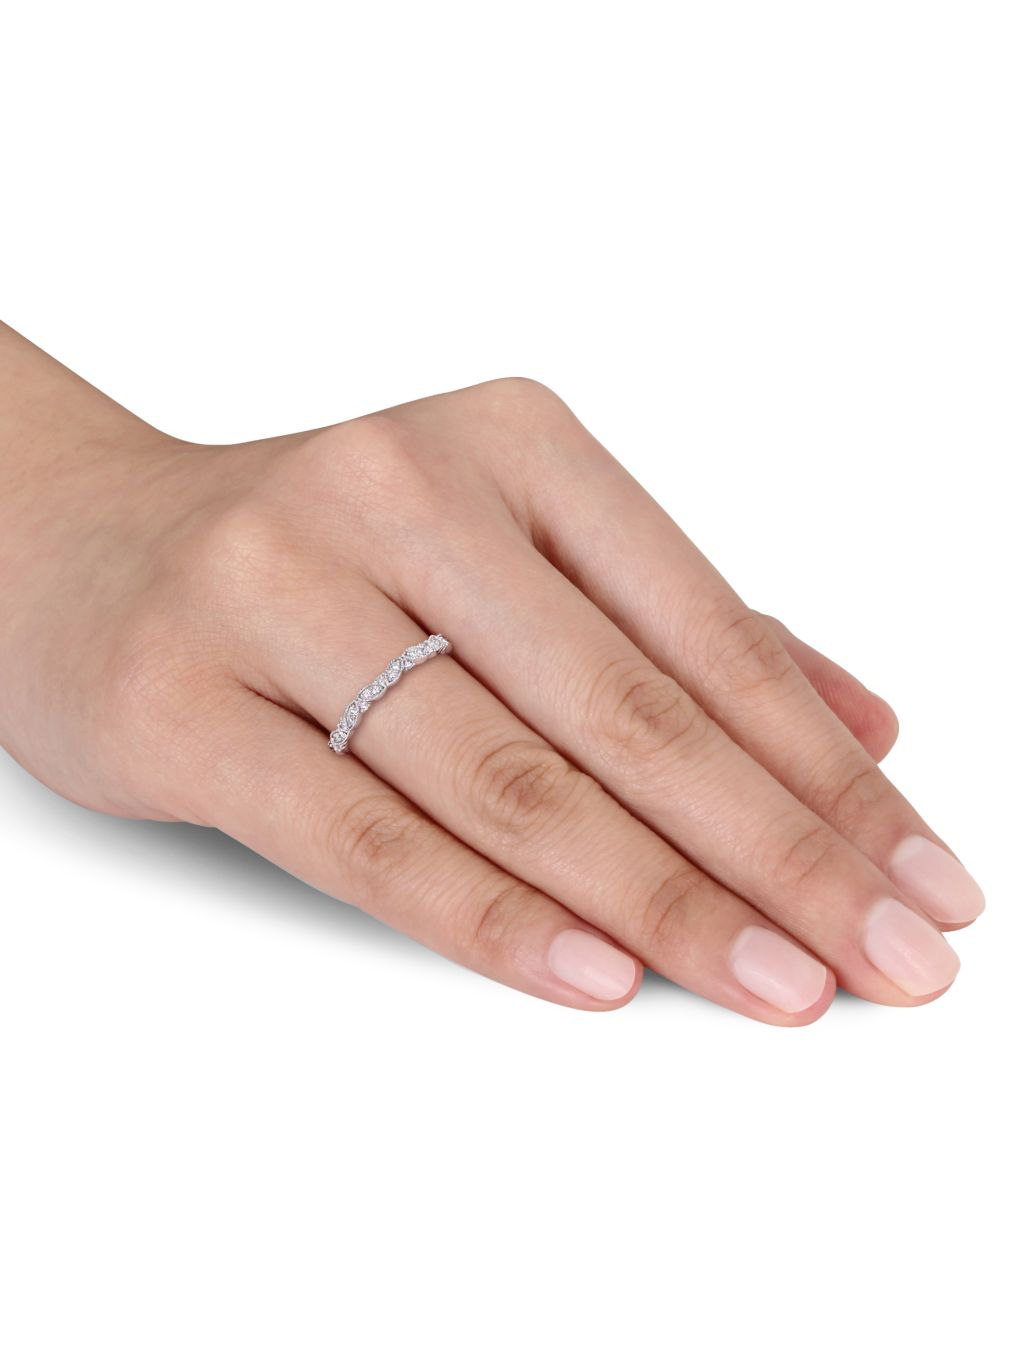 Sonatina 14K White Gold & Diamond Ring